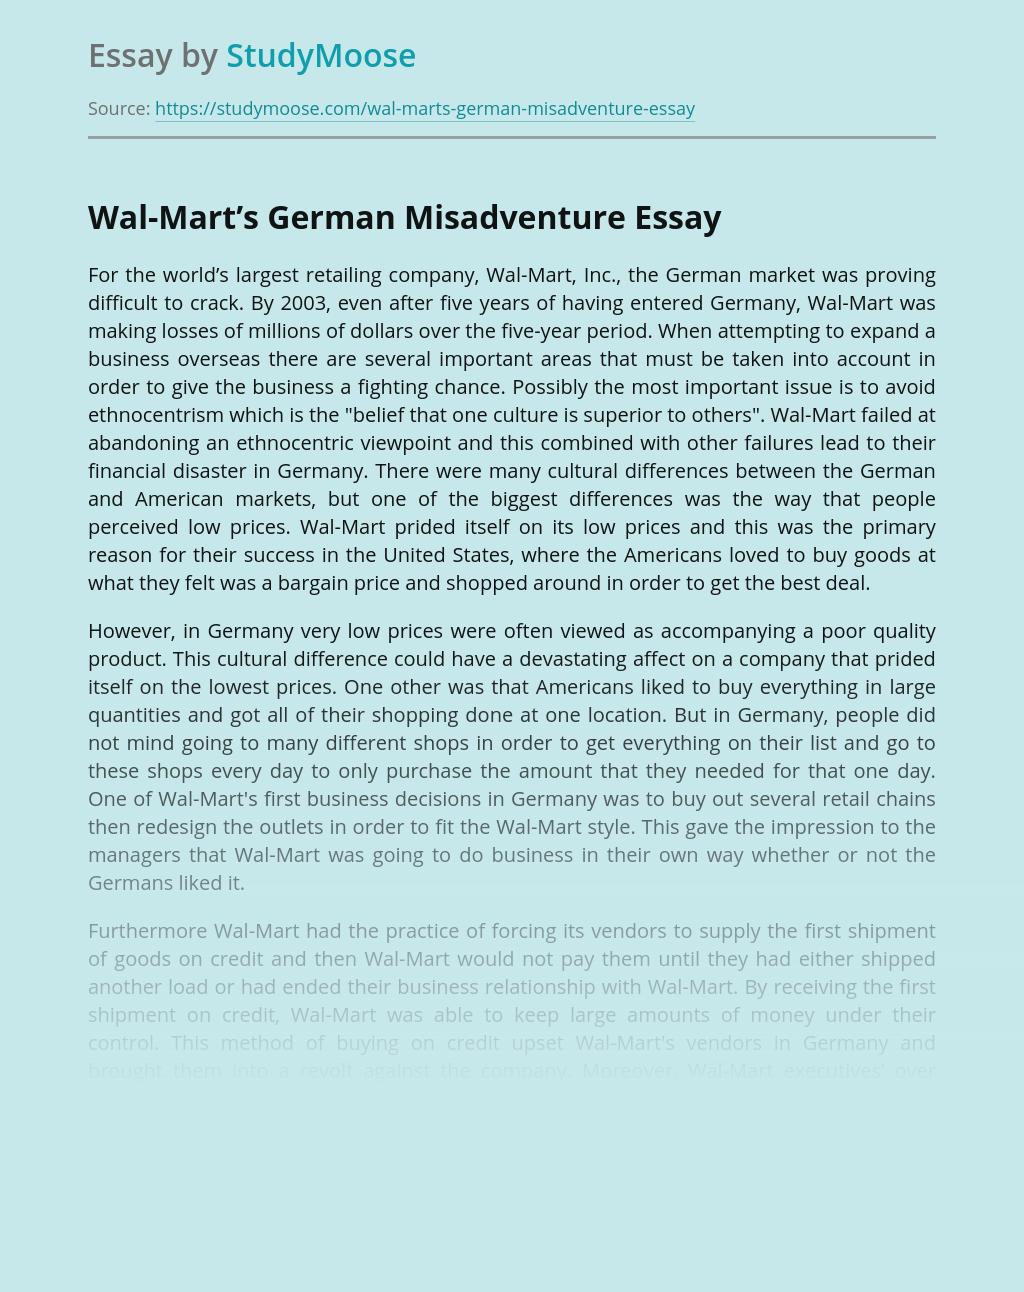 Wal-Mart's German Misadventure